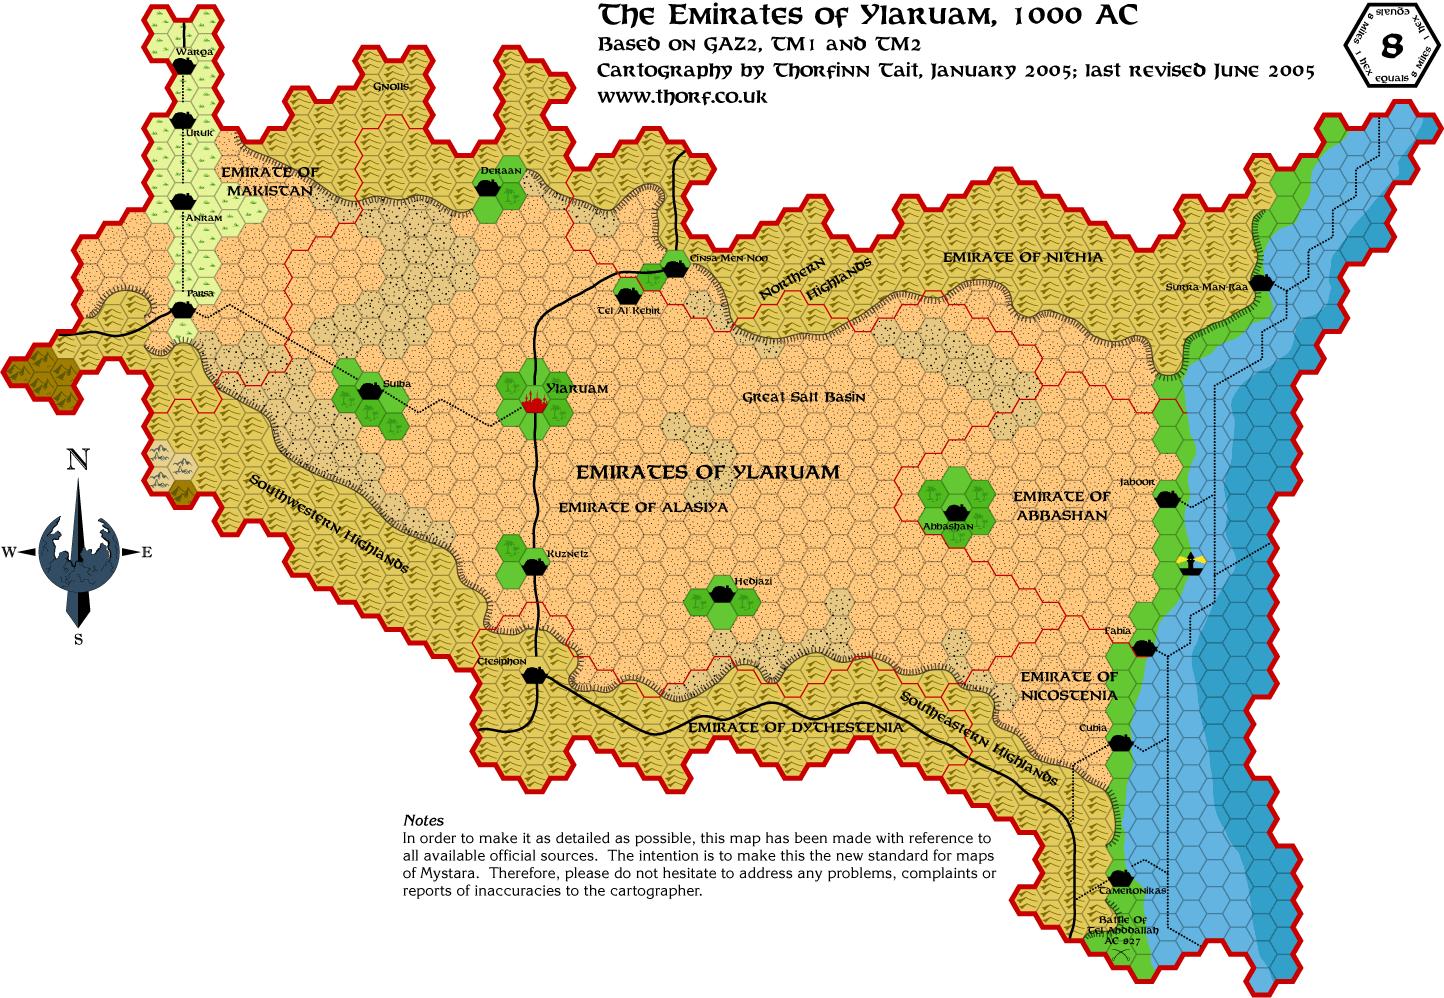 Ylaruam map